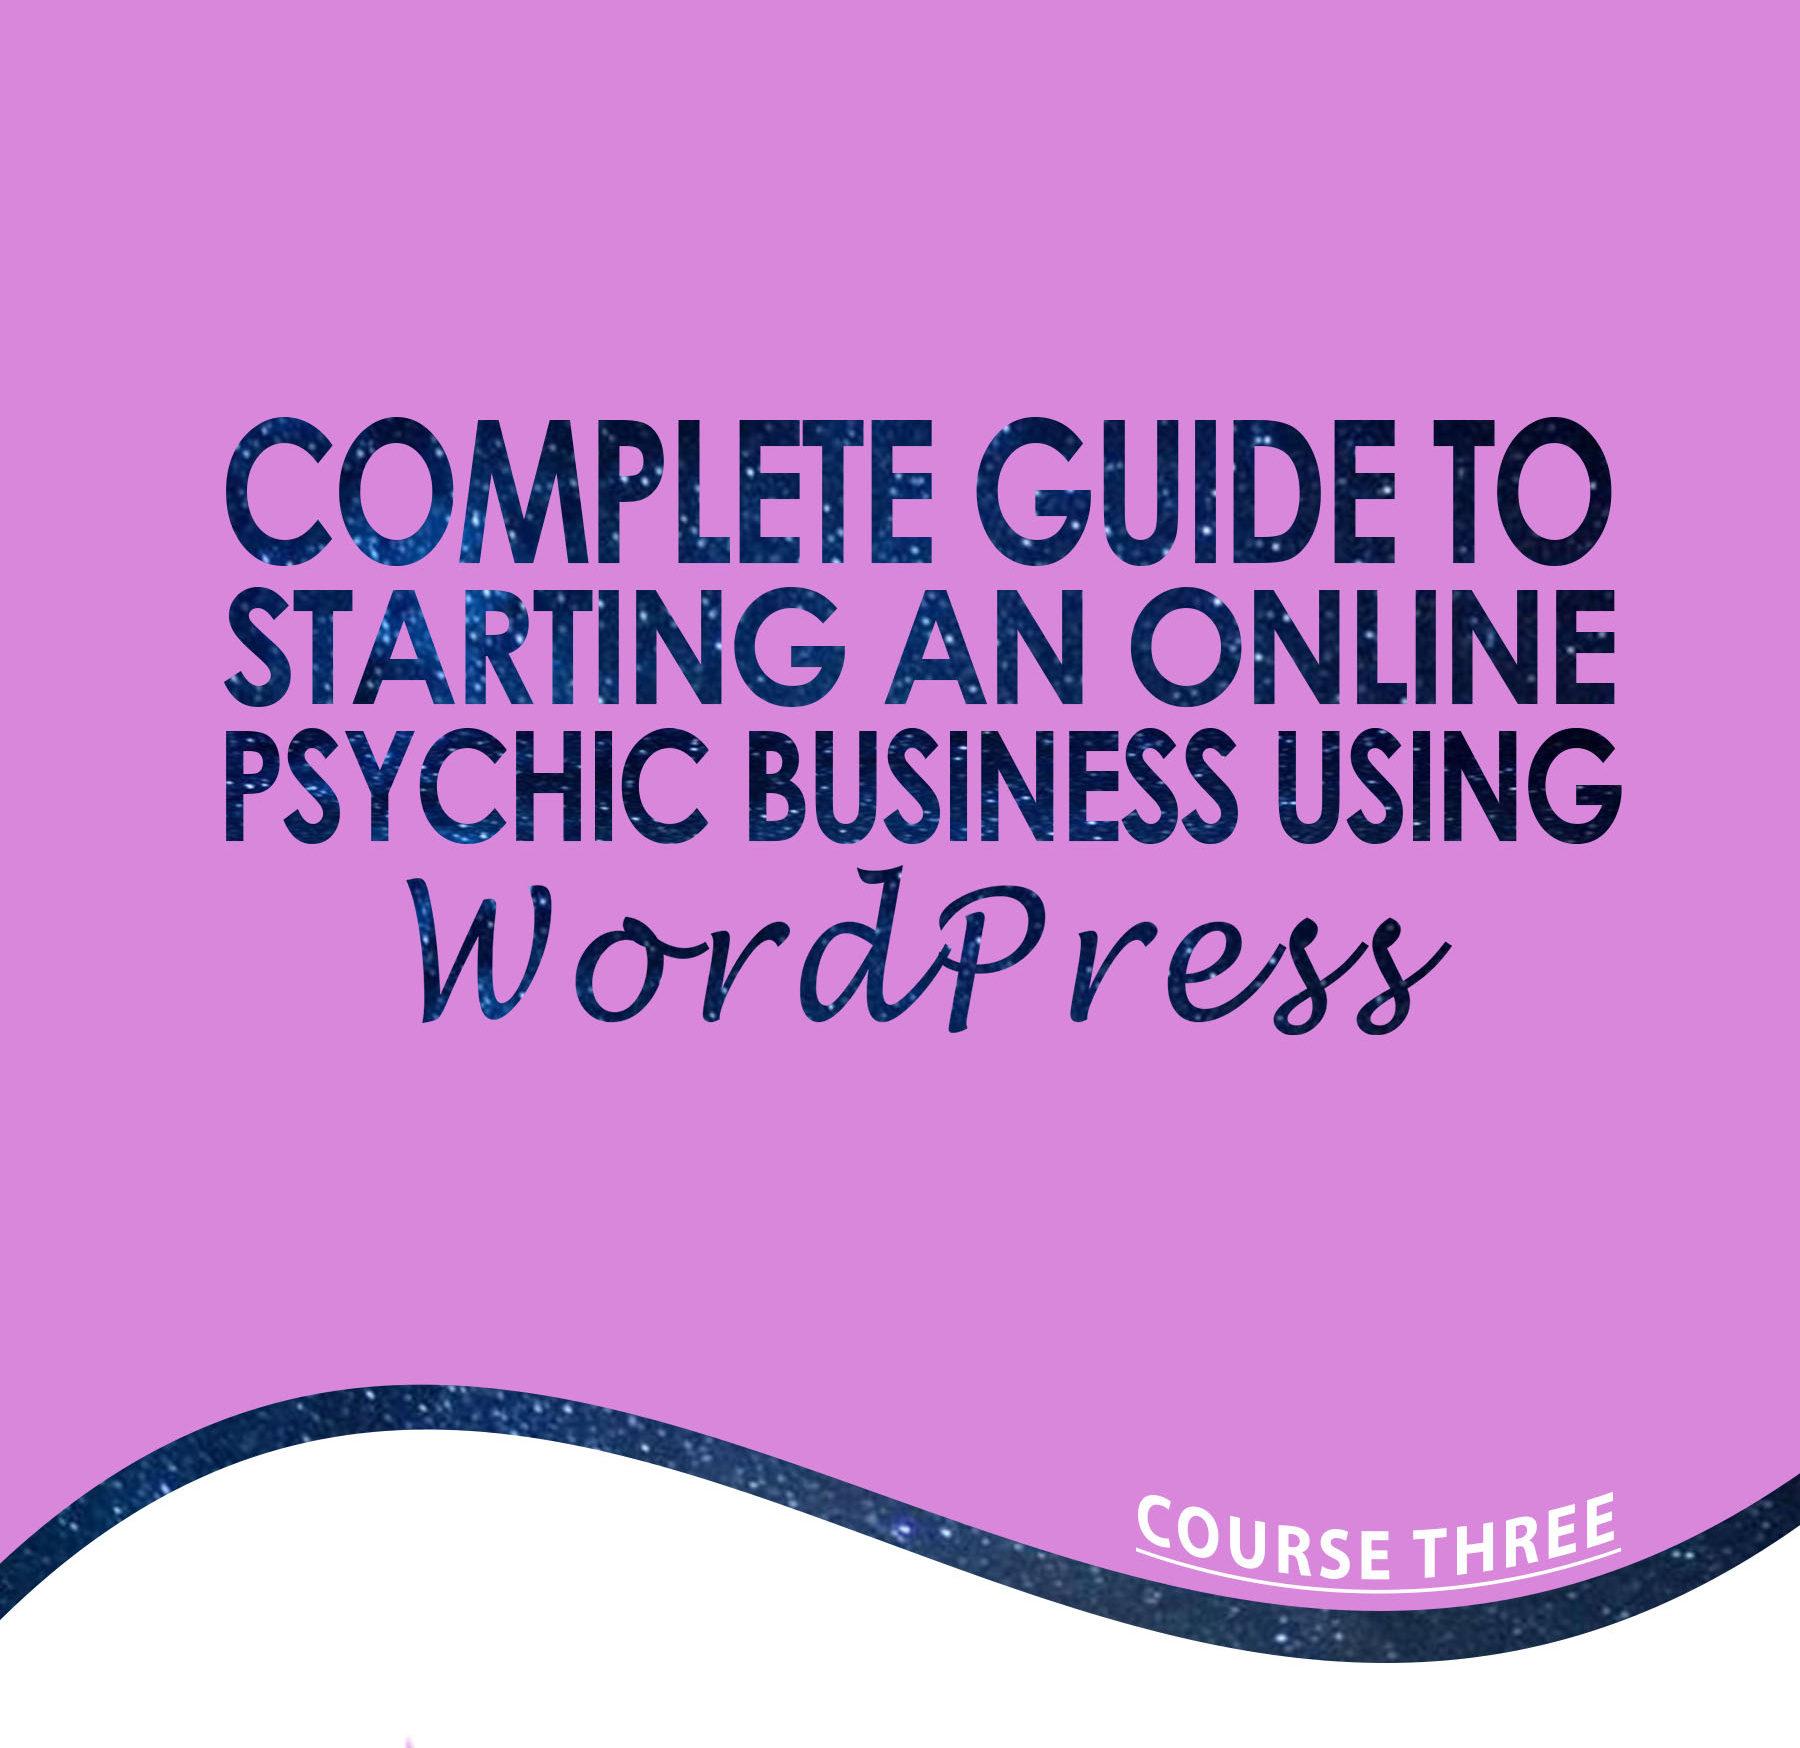 Building an Online Psychic Business Using Wordpress